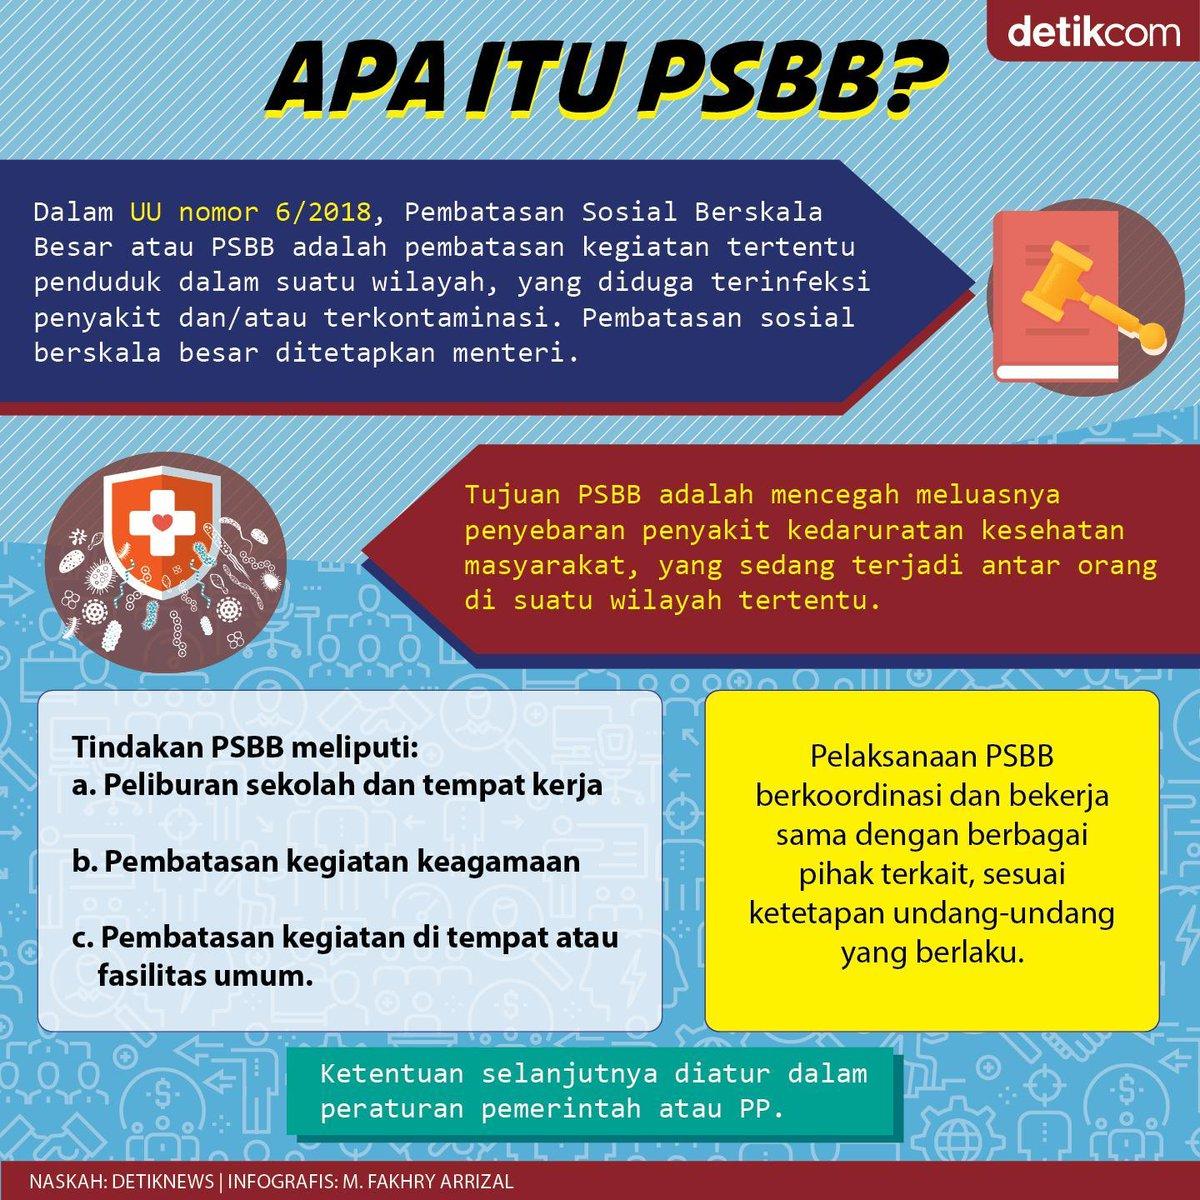 Pembatasan Sosial Berskala Besar - PSBB